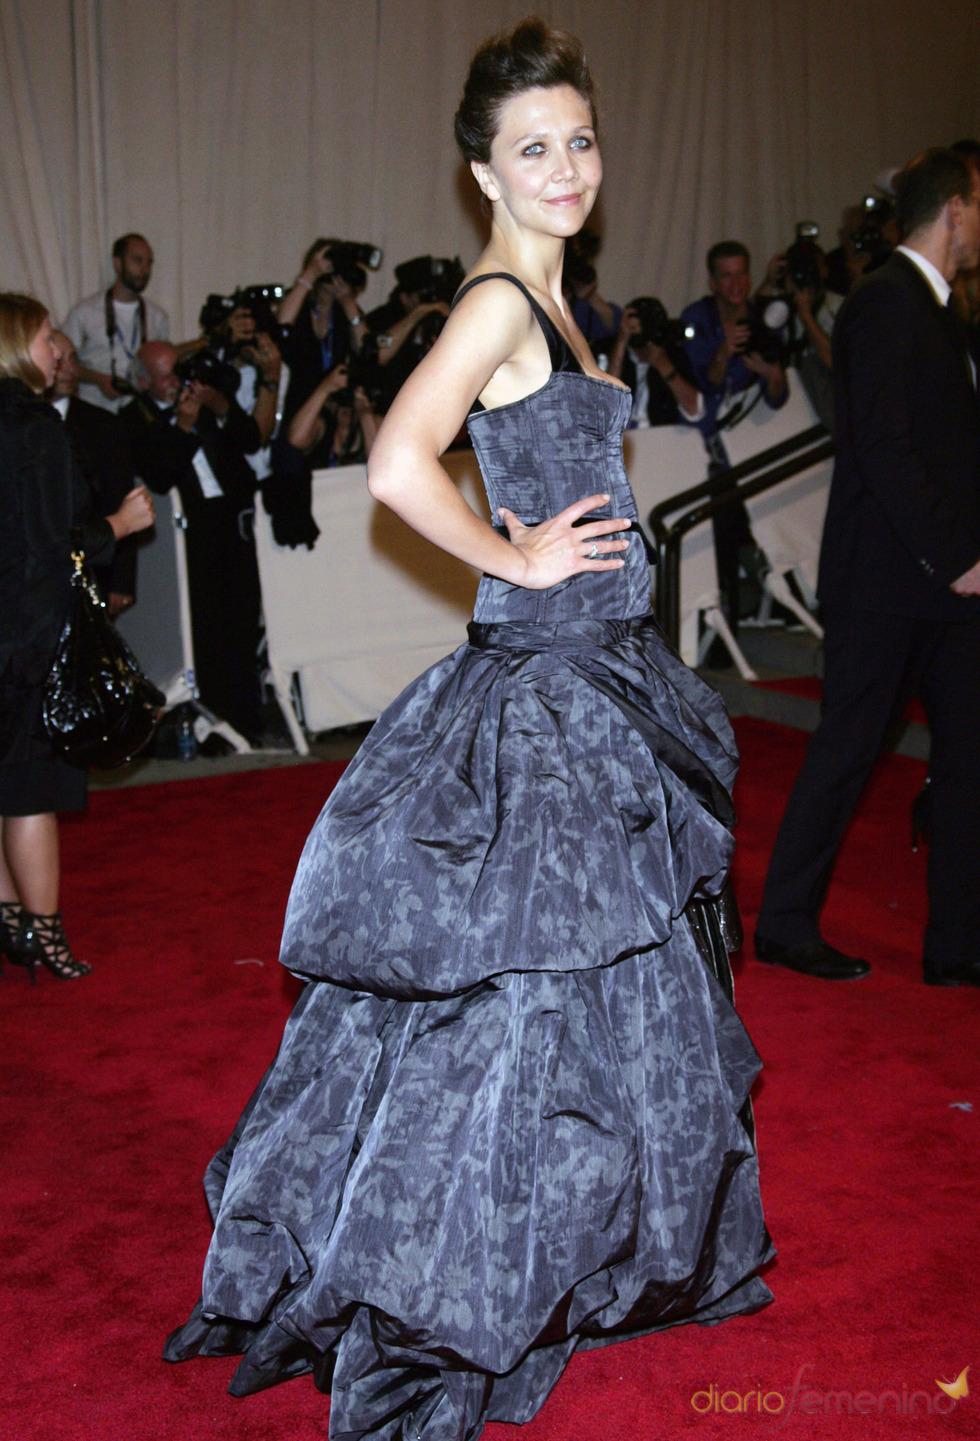 Maggie Gyllenhaal en la gala del Costume Institute